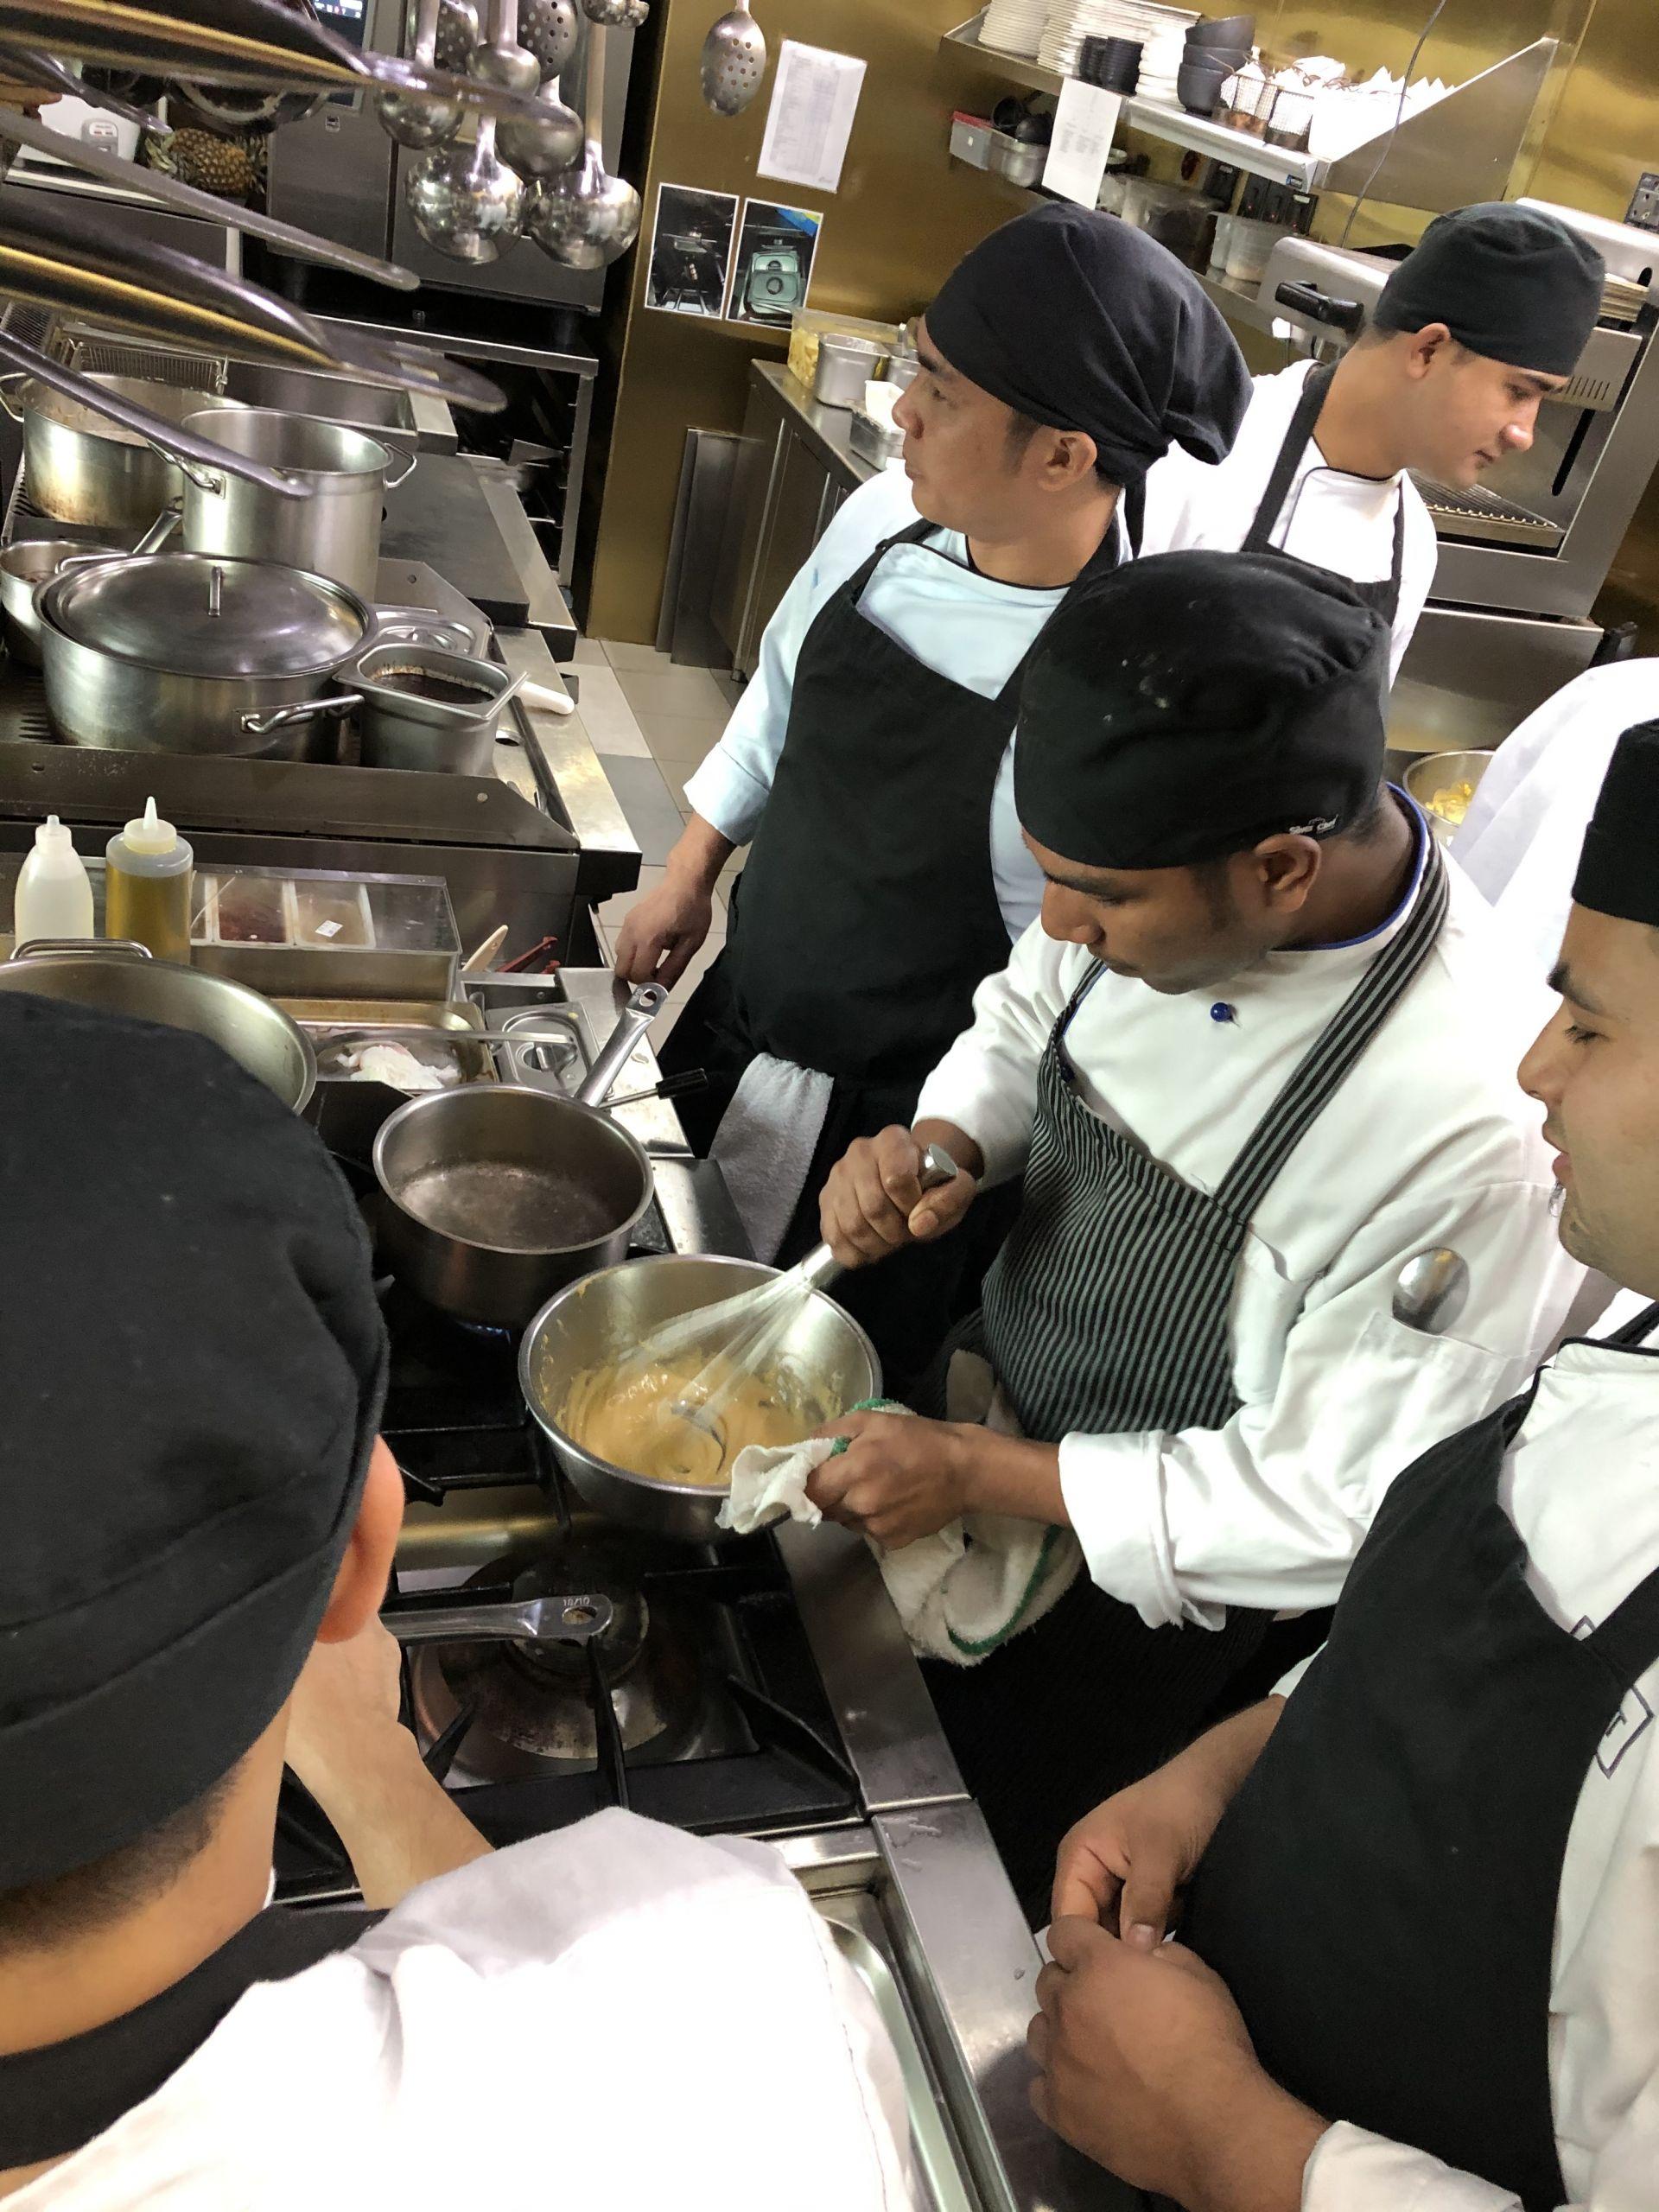 chef training on the job